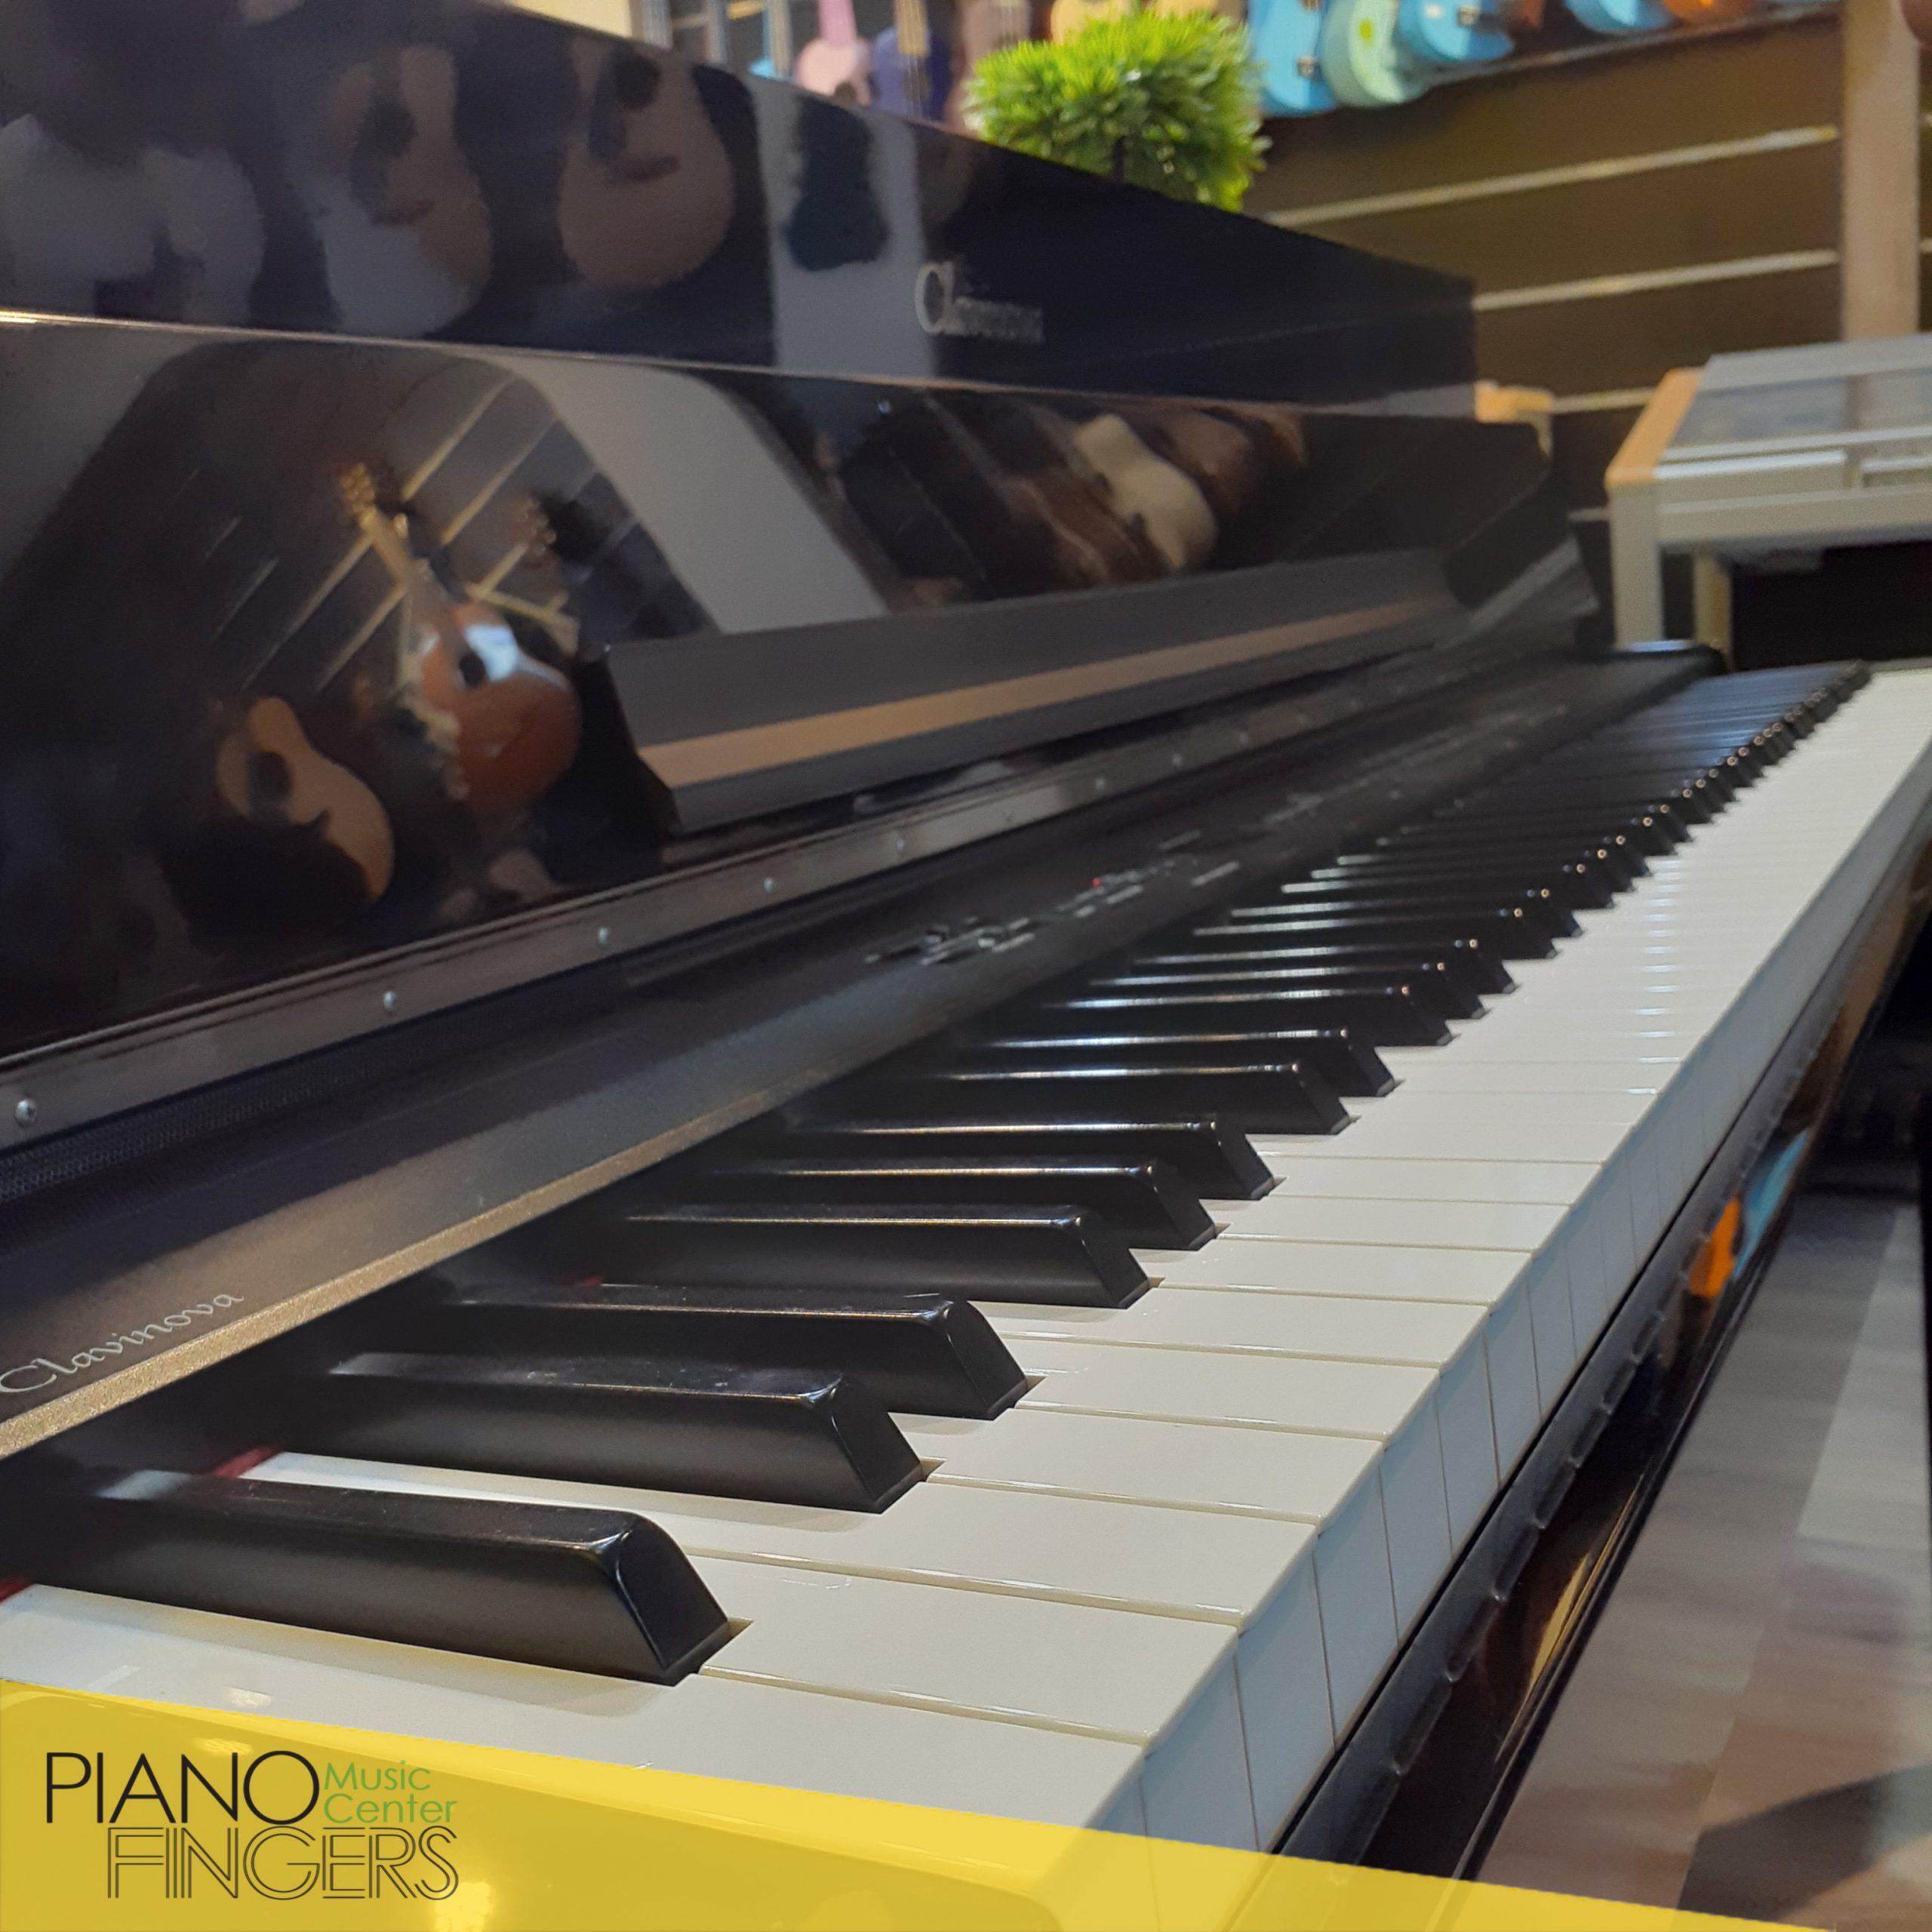 dan-piano-dien-yamaha-clp-f01-3 (1)